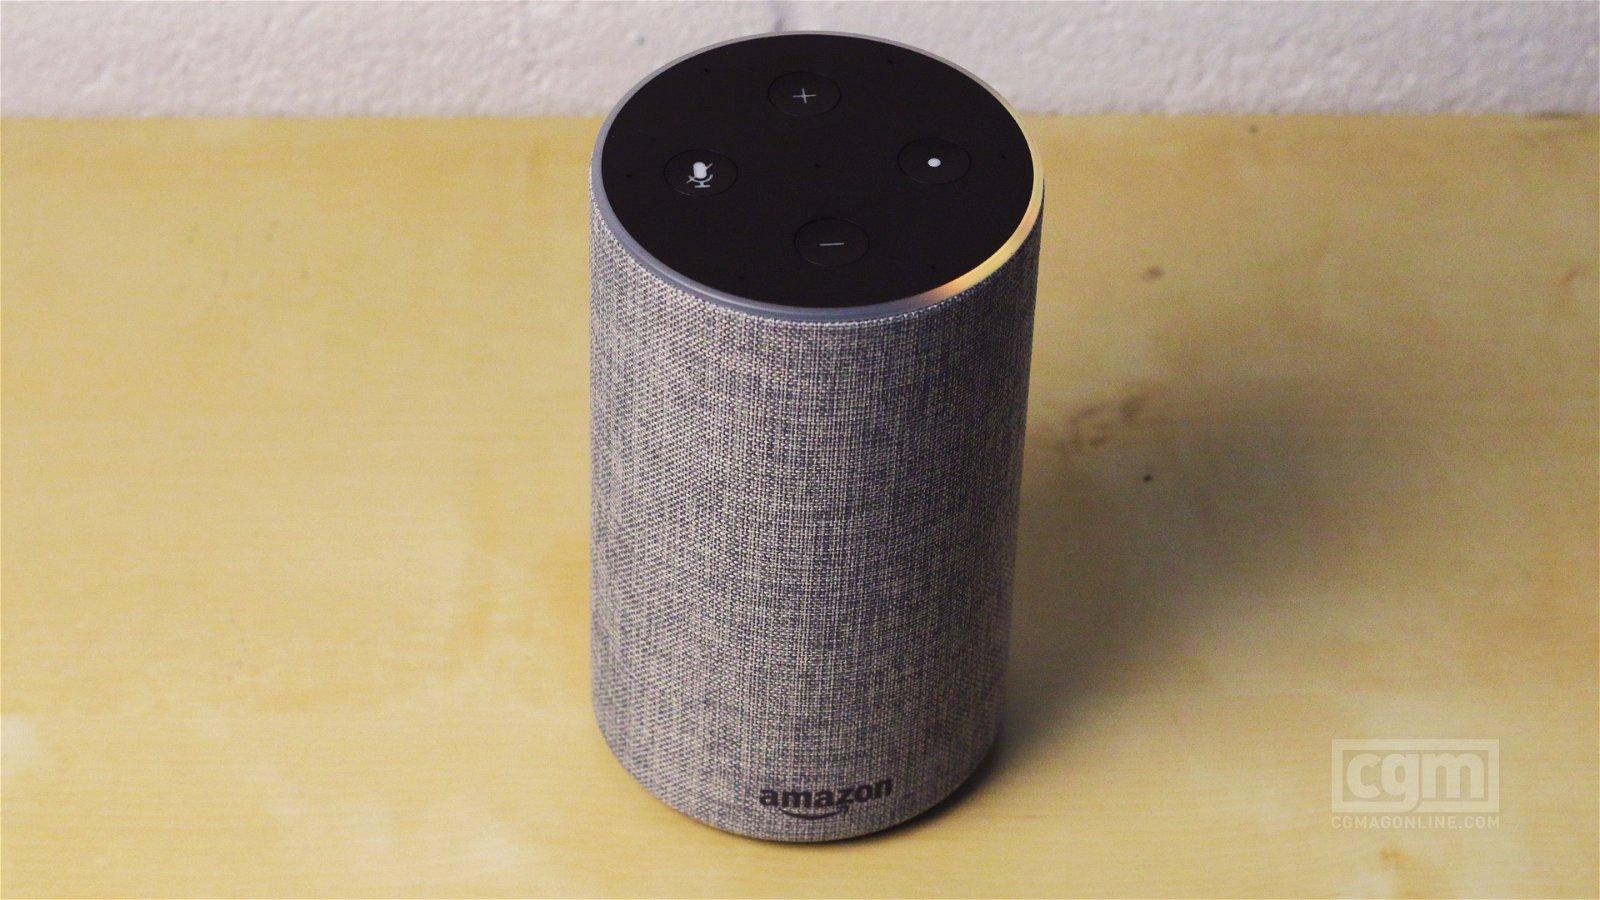 Amazon Echo 2 (Hardware) Review 1